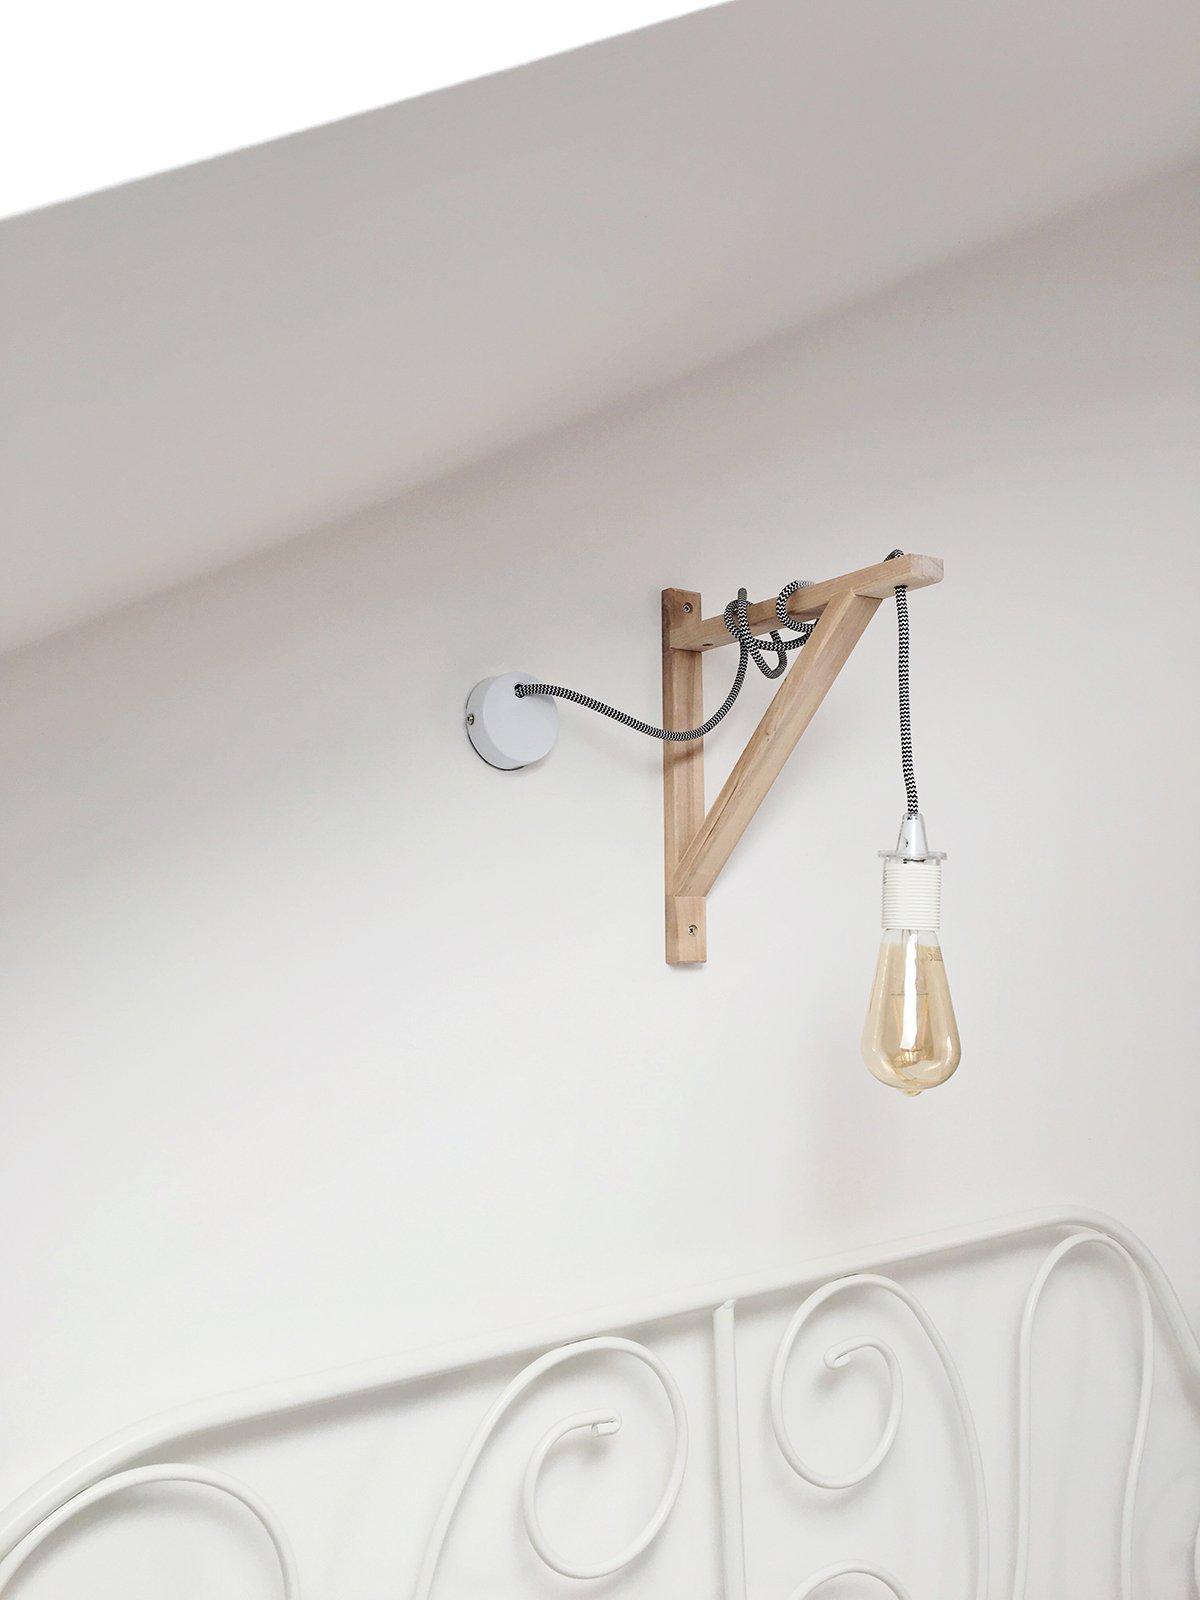 DIY_wall_hanging_lamp_lightbulb_4